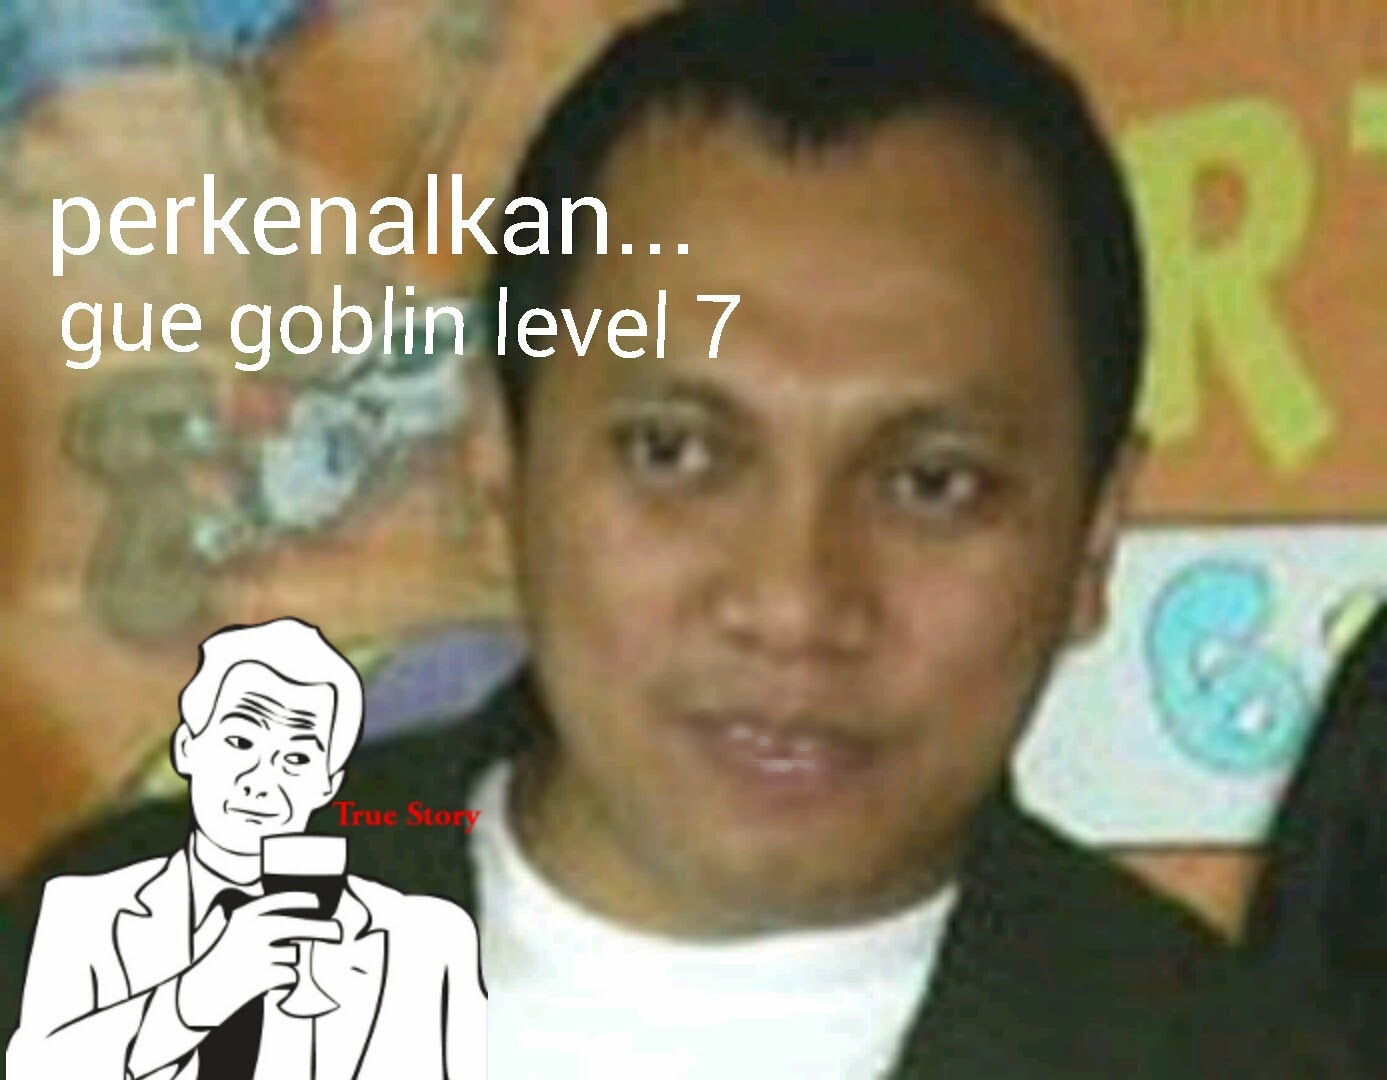 Gambar Dp Bbm Coc Lucu Goblin Level Terakhir Foto Gambar Lucu Dp